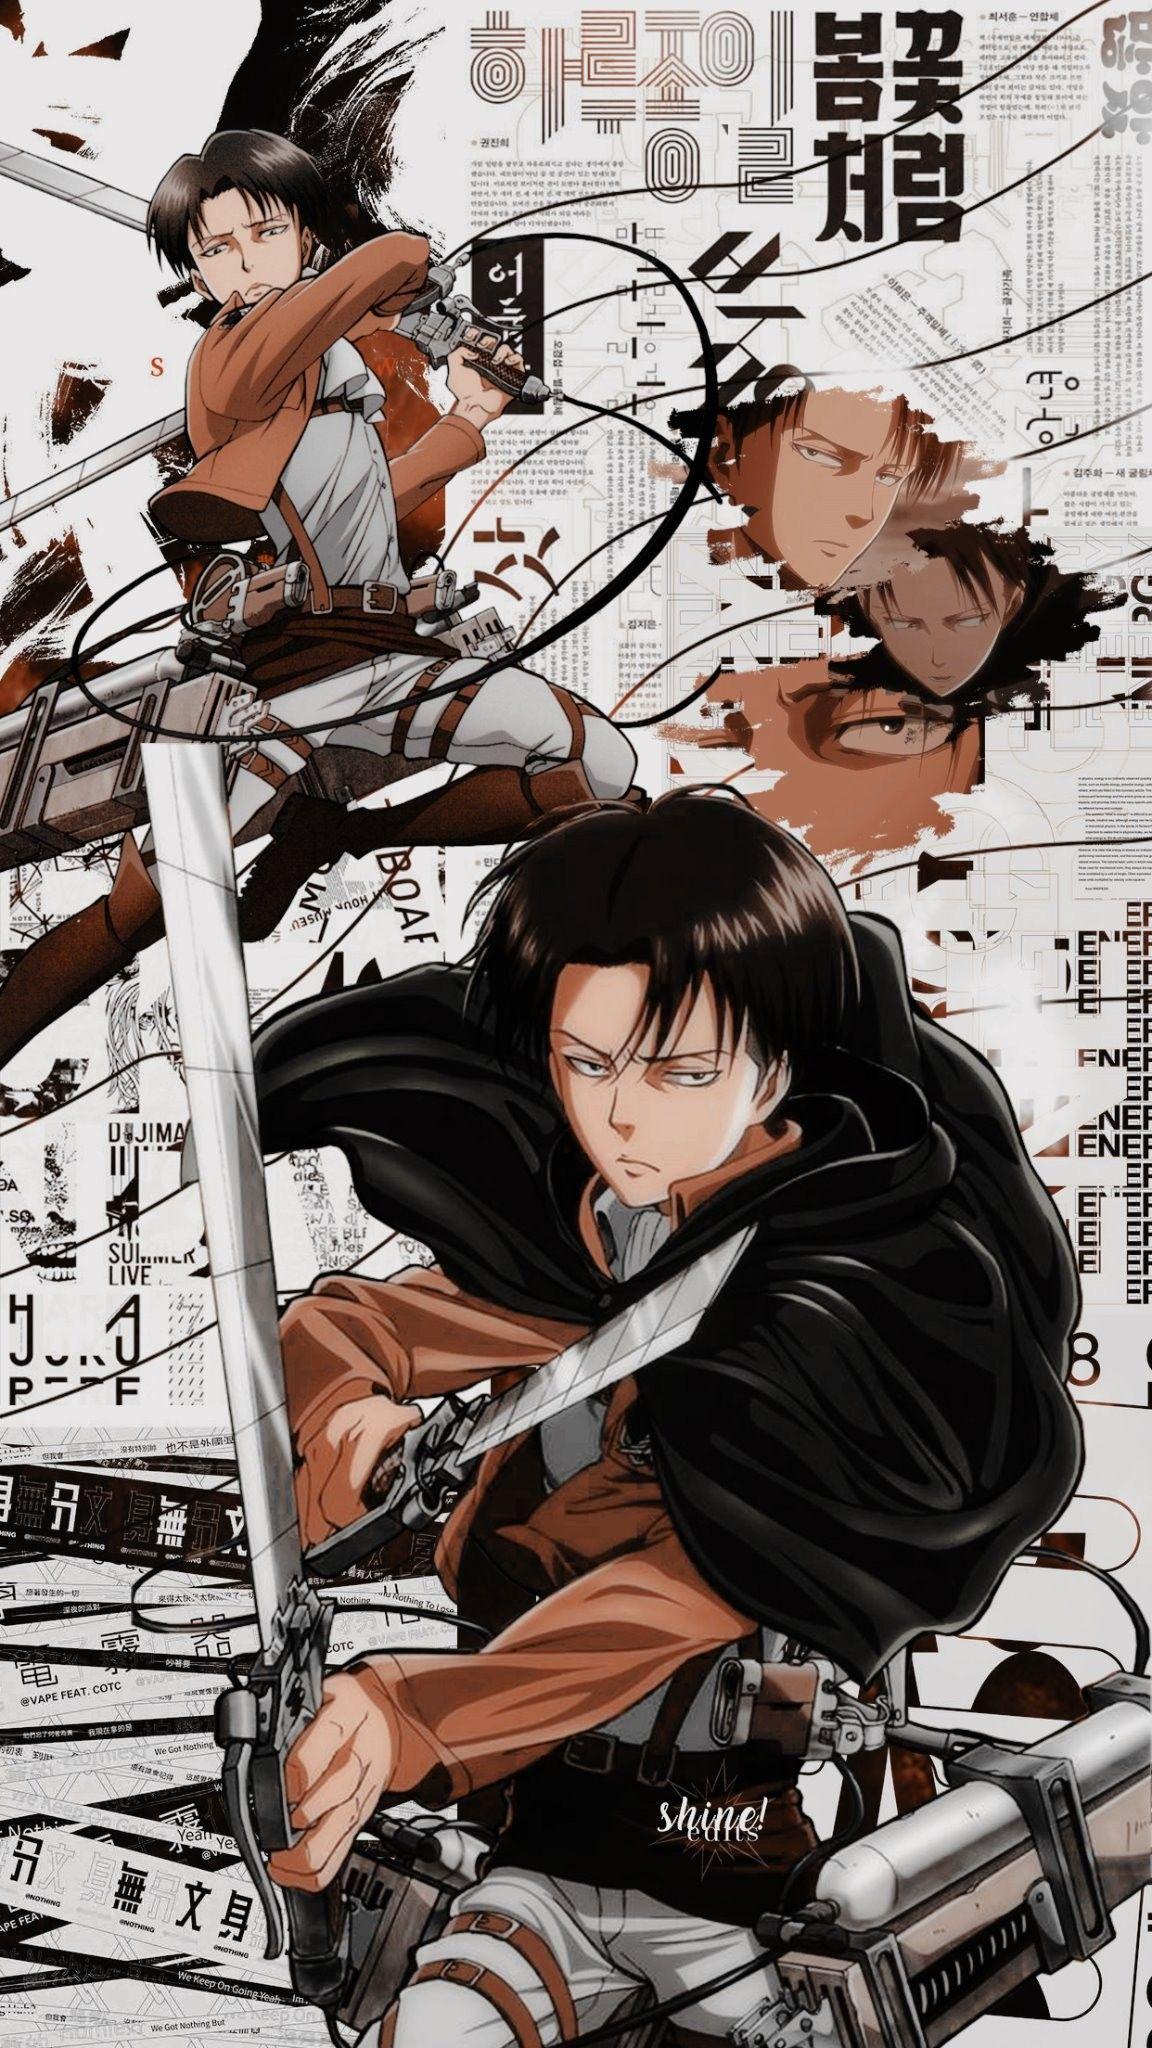 Levi Lockscreen Shingeki No Kyojin Shinedlts On Twitter If You Use Something Give Credits In In 2020 Anime Tapete Desktop Hintergrund Schwarzer Hintergrund